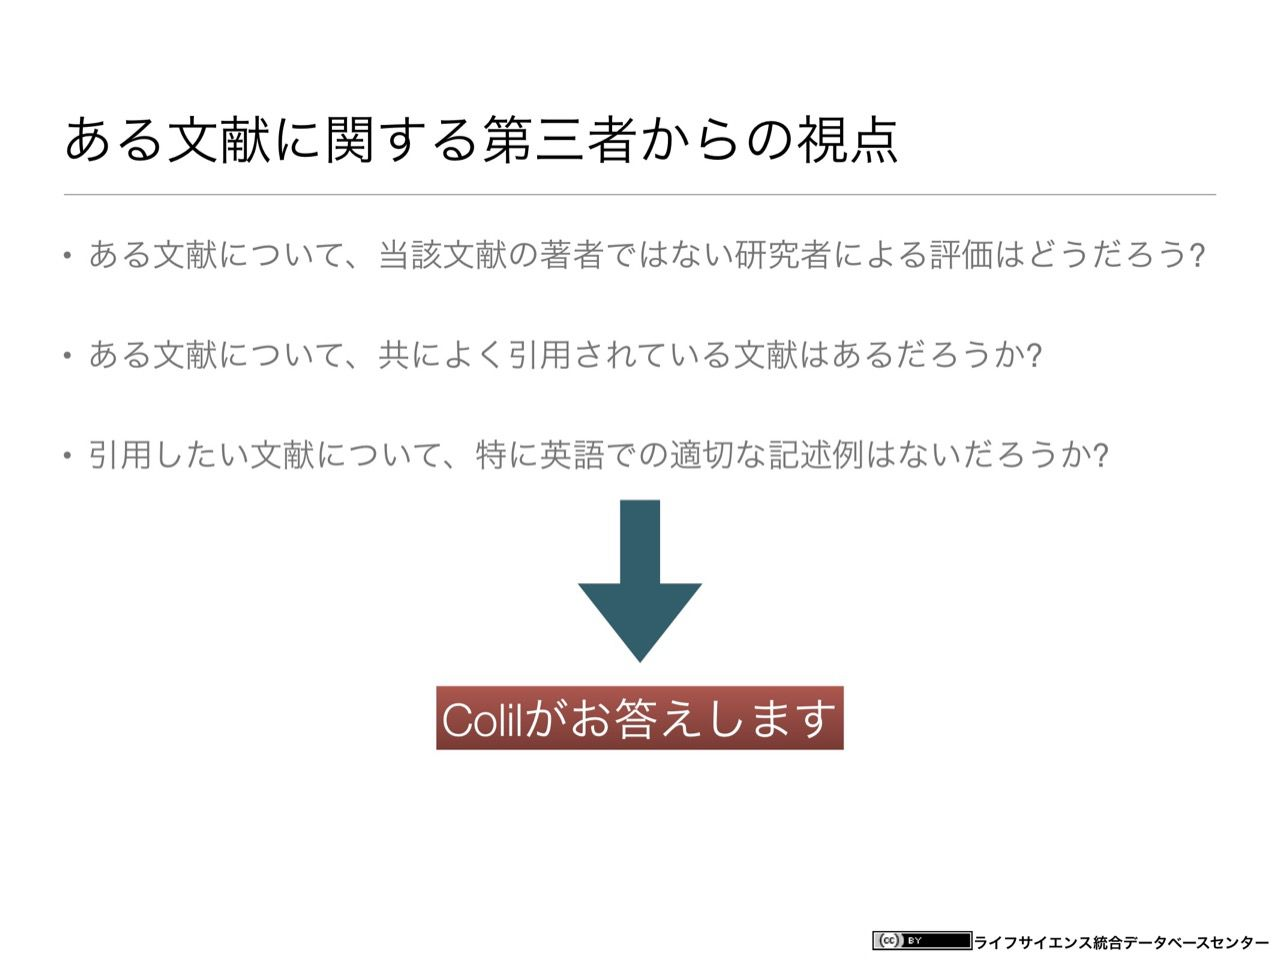 images/AJACS60_yamamoto_059.jpg